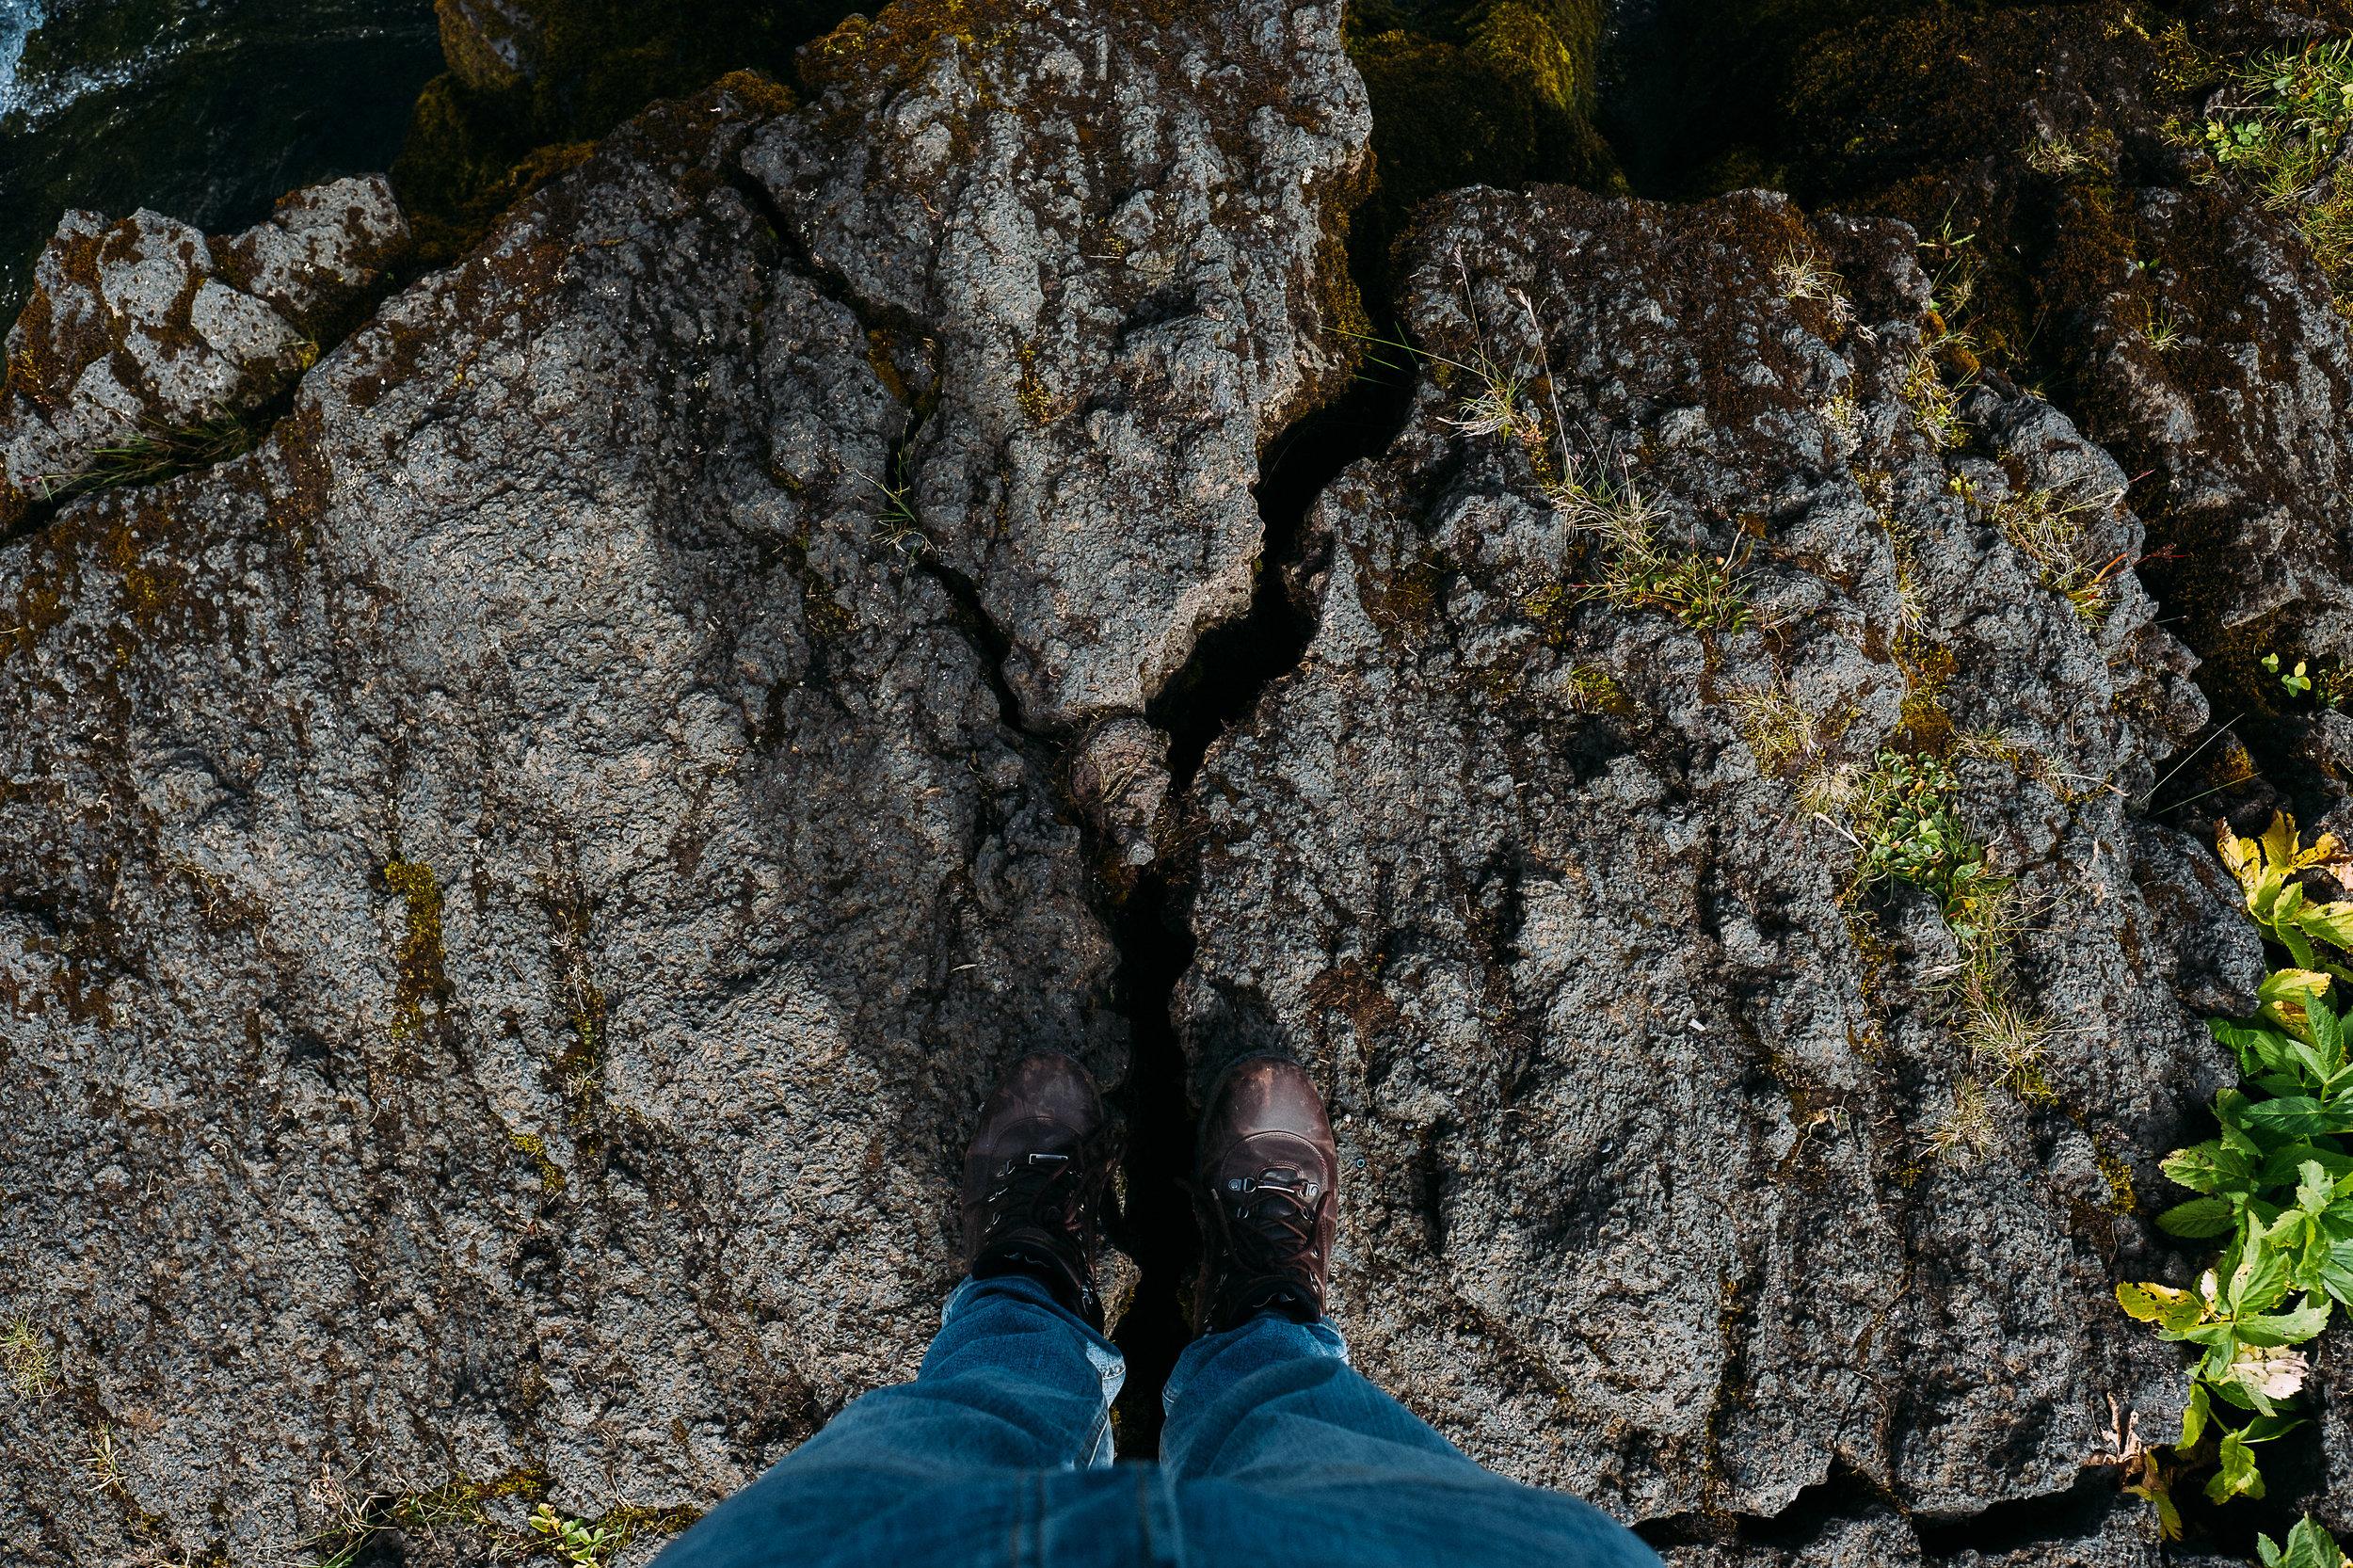 iceland feet-12.jpg